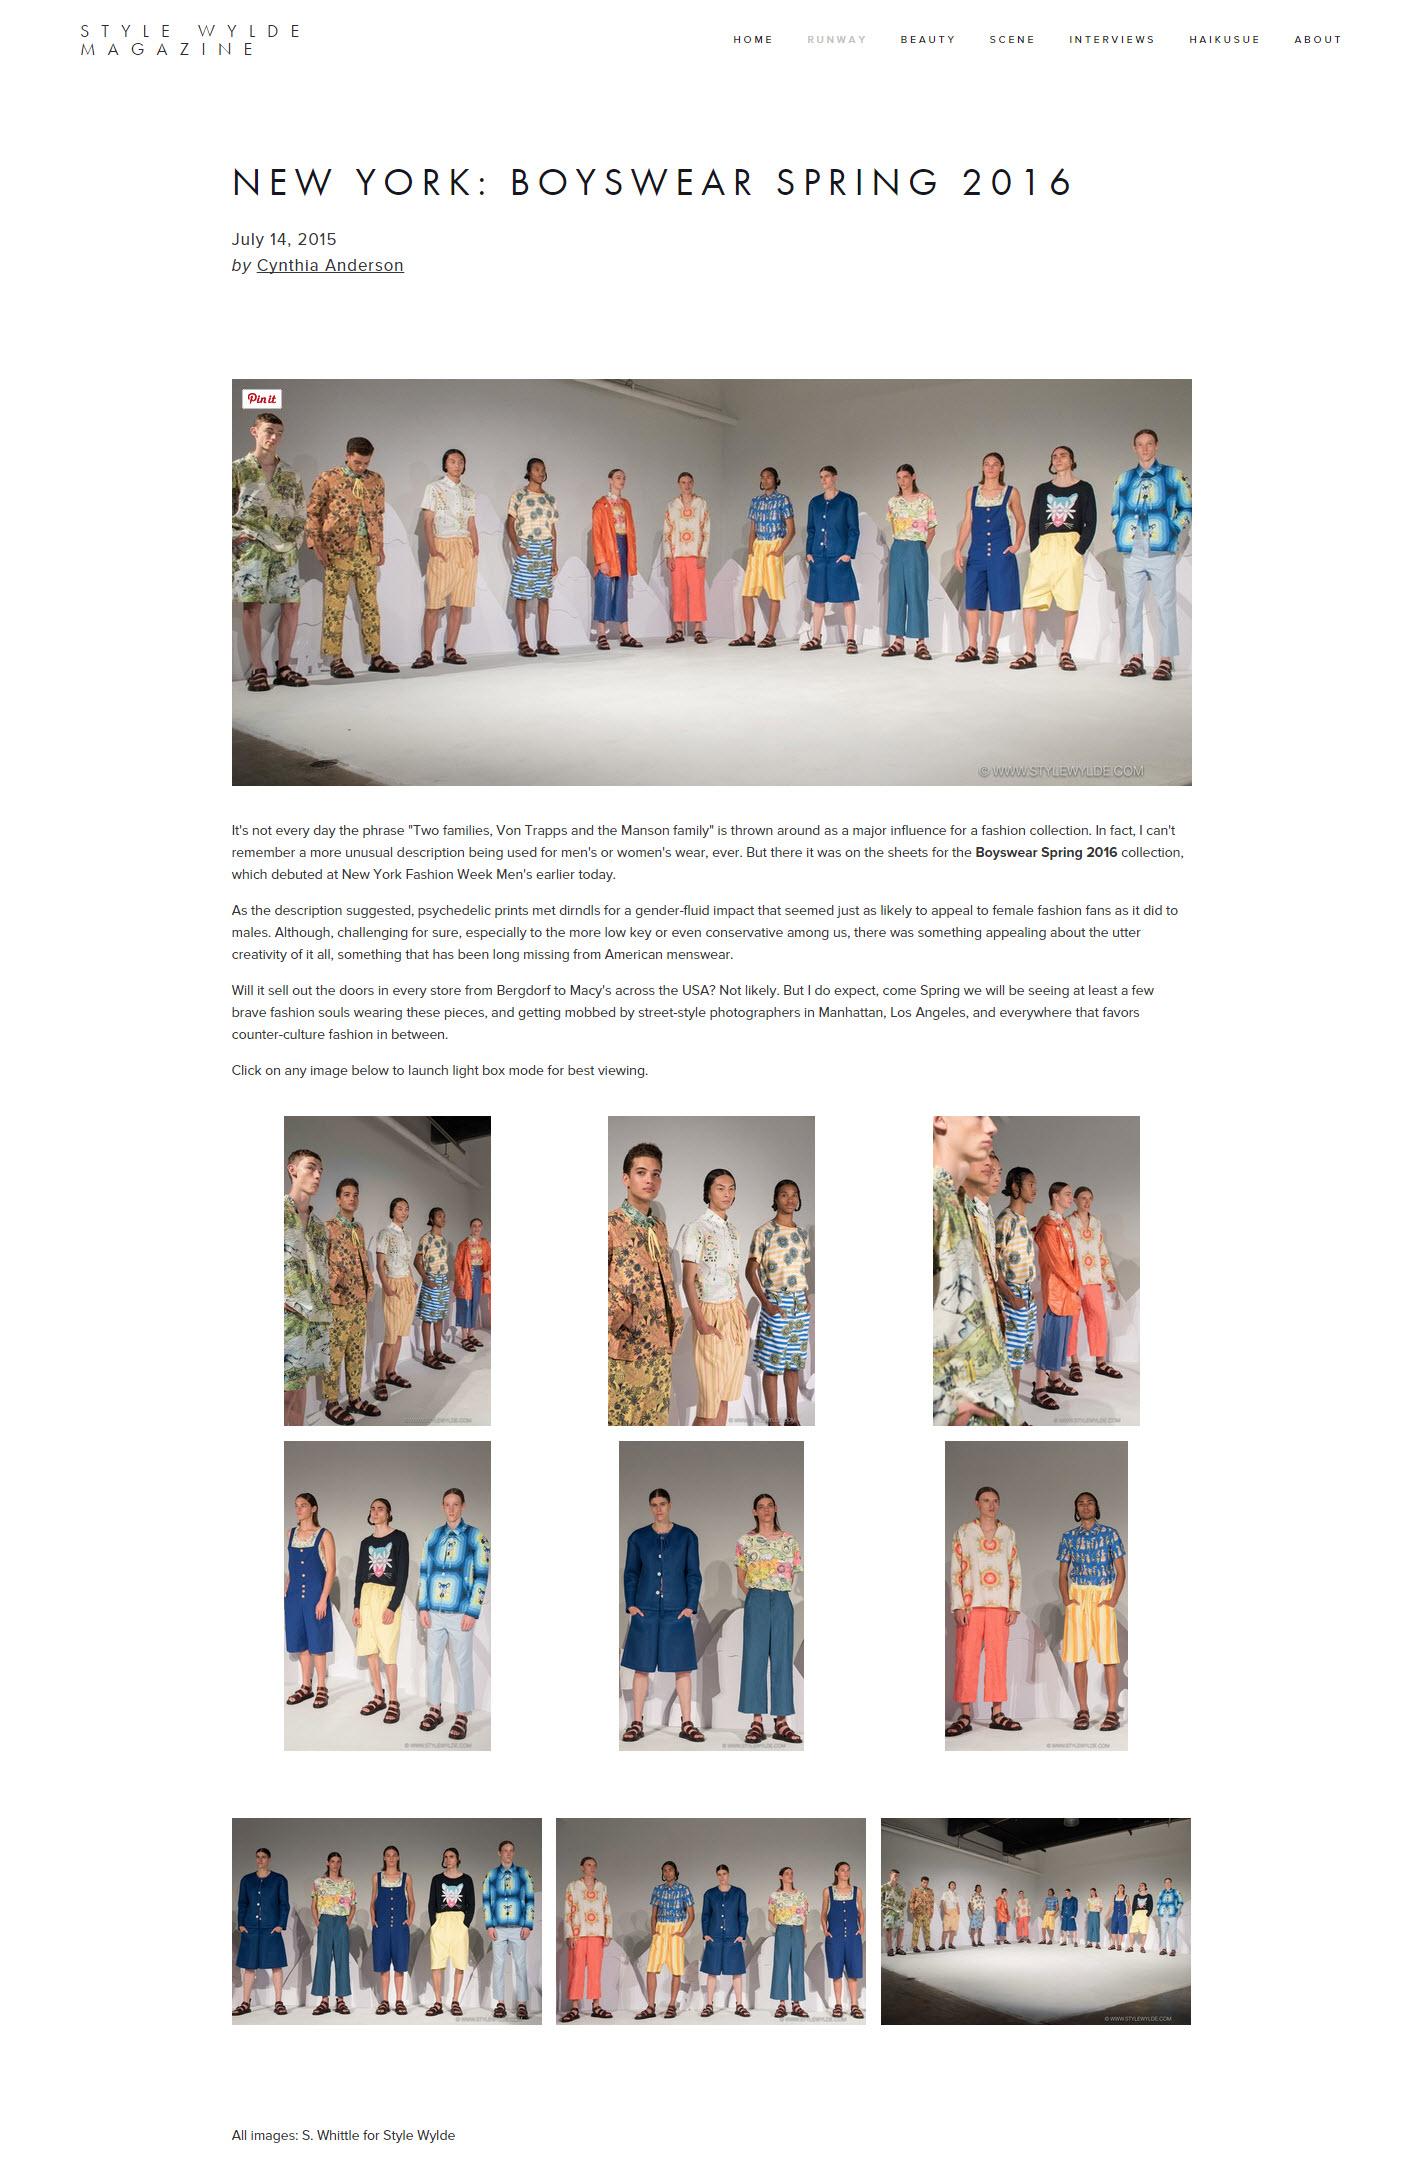 StyleWylde.com 7.14.15.jpg